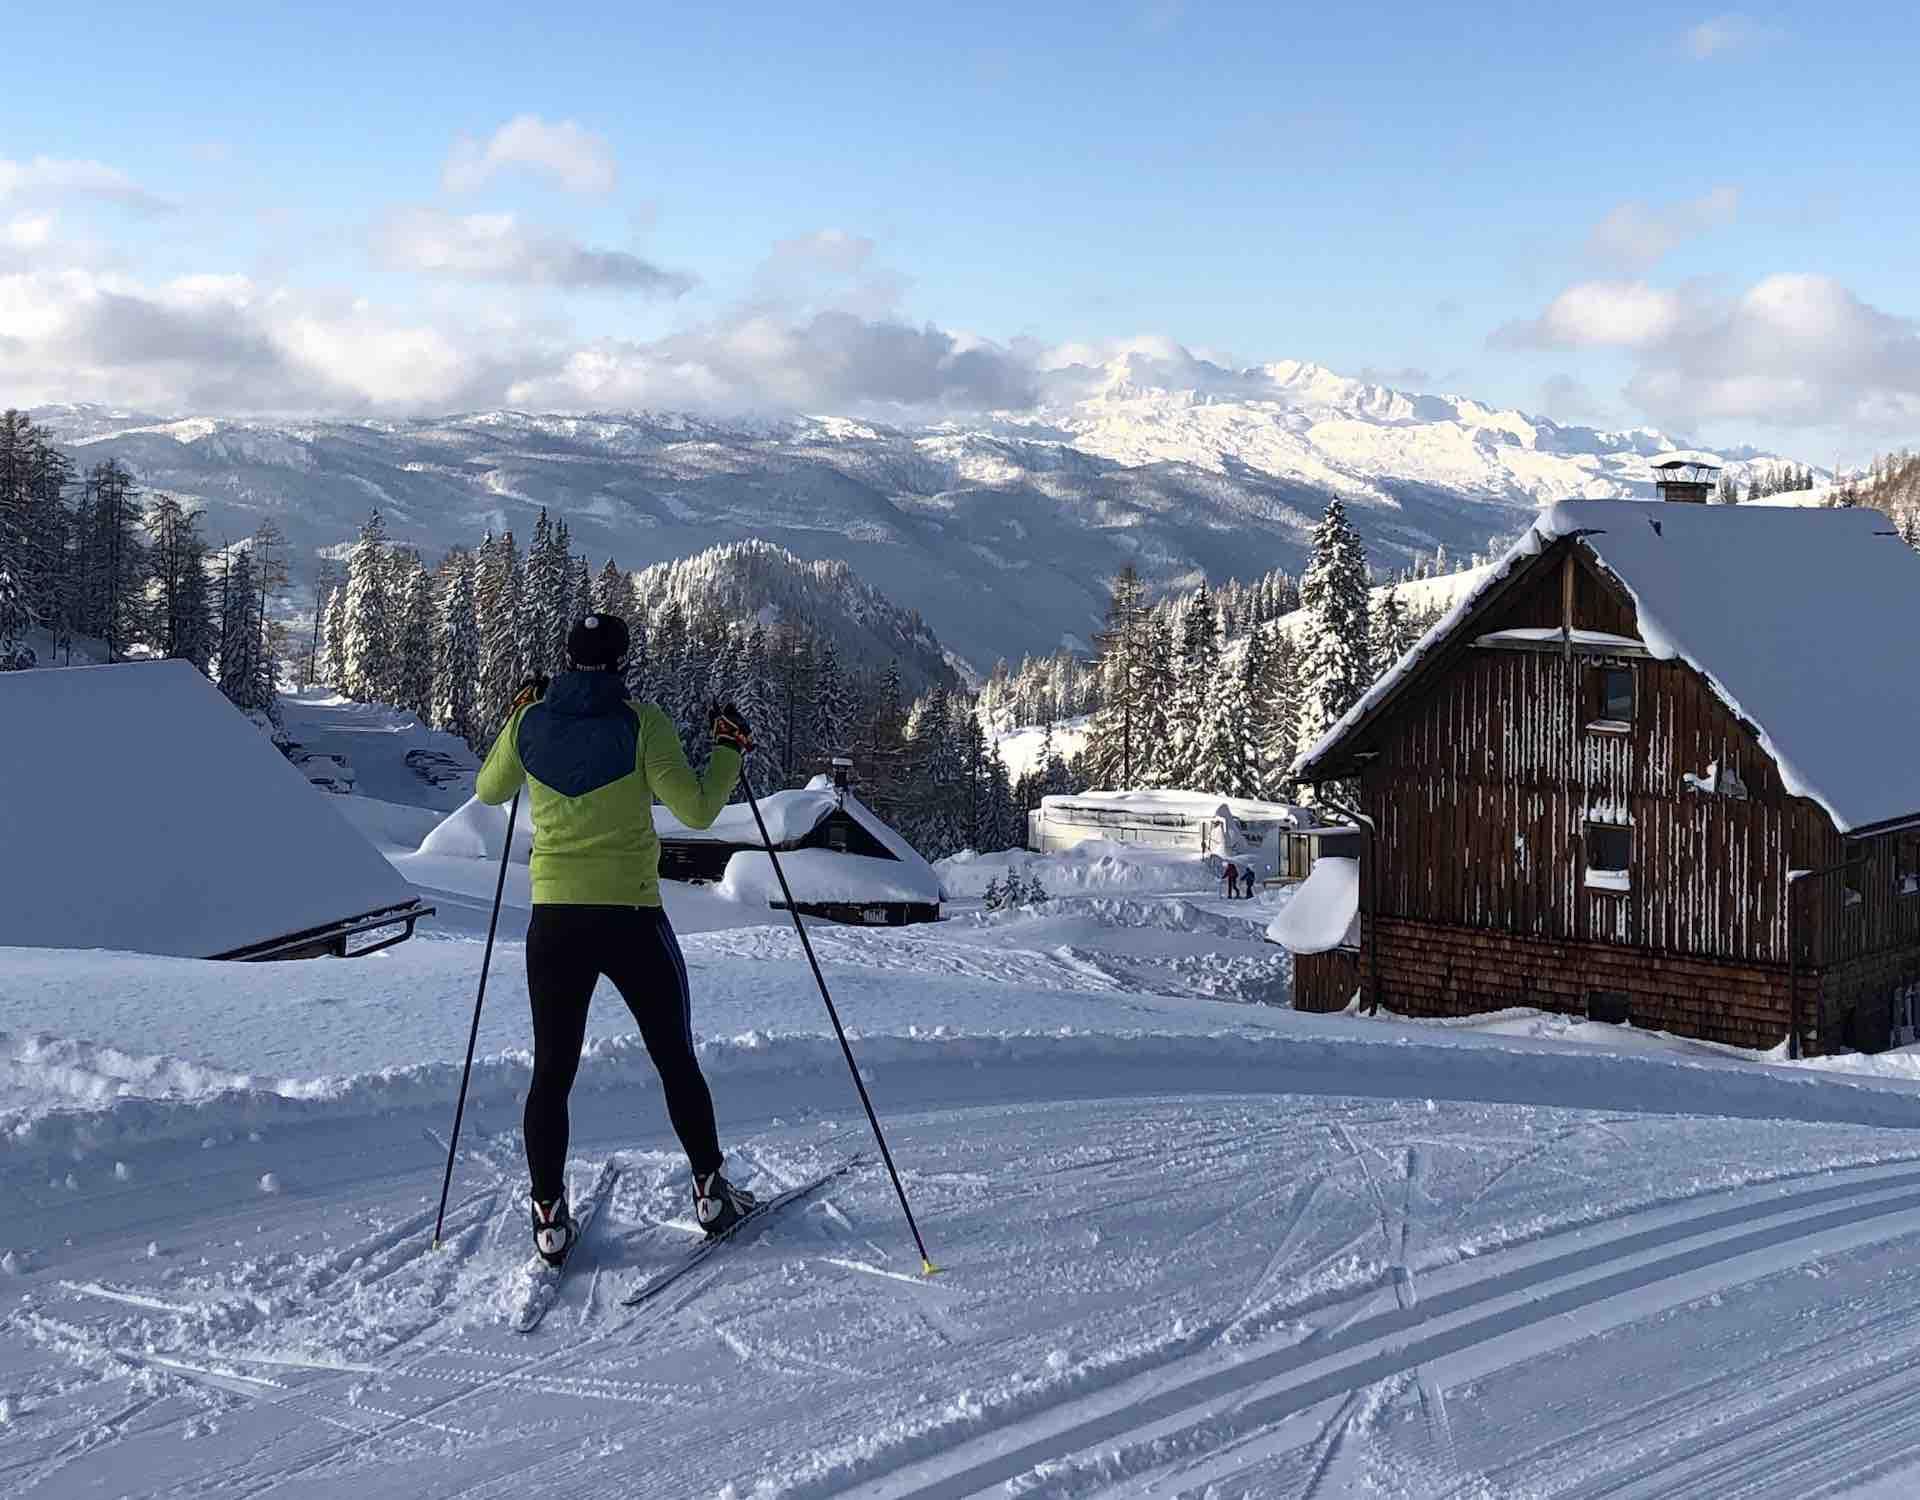 Langlaufen lernen tipps Nordic Academy Hasi mit tollen Ausblicken